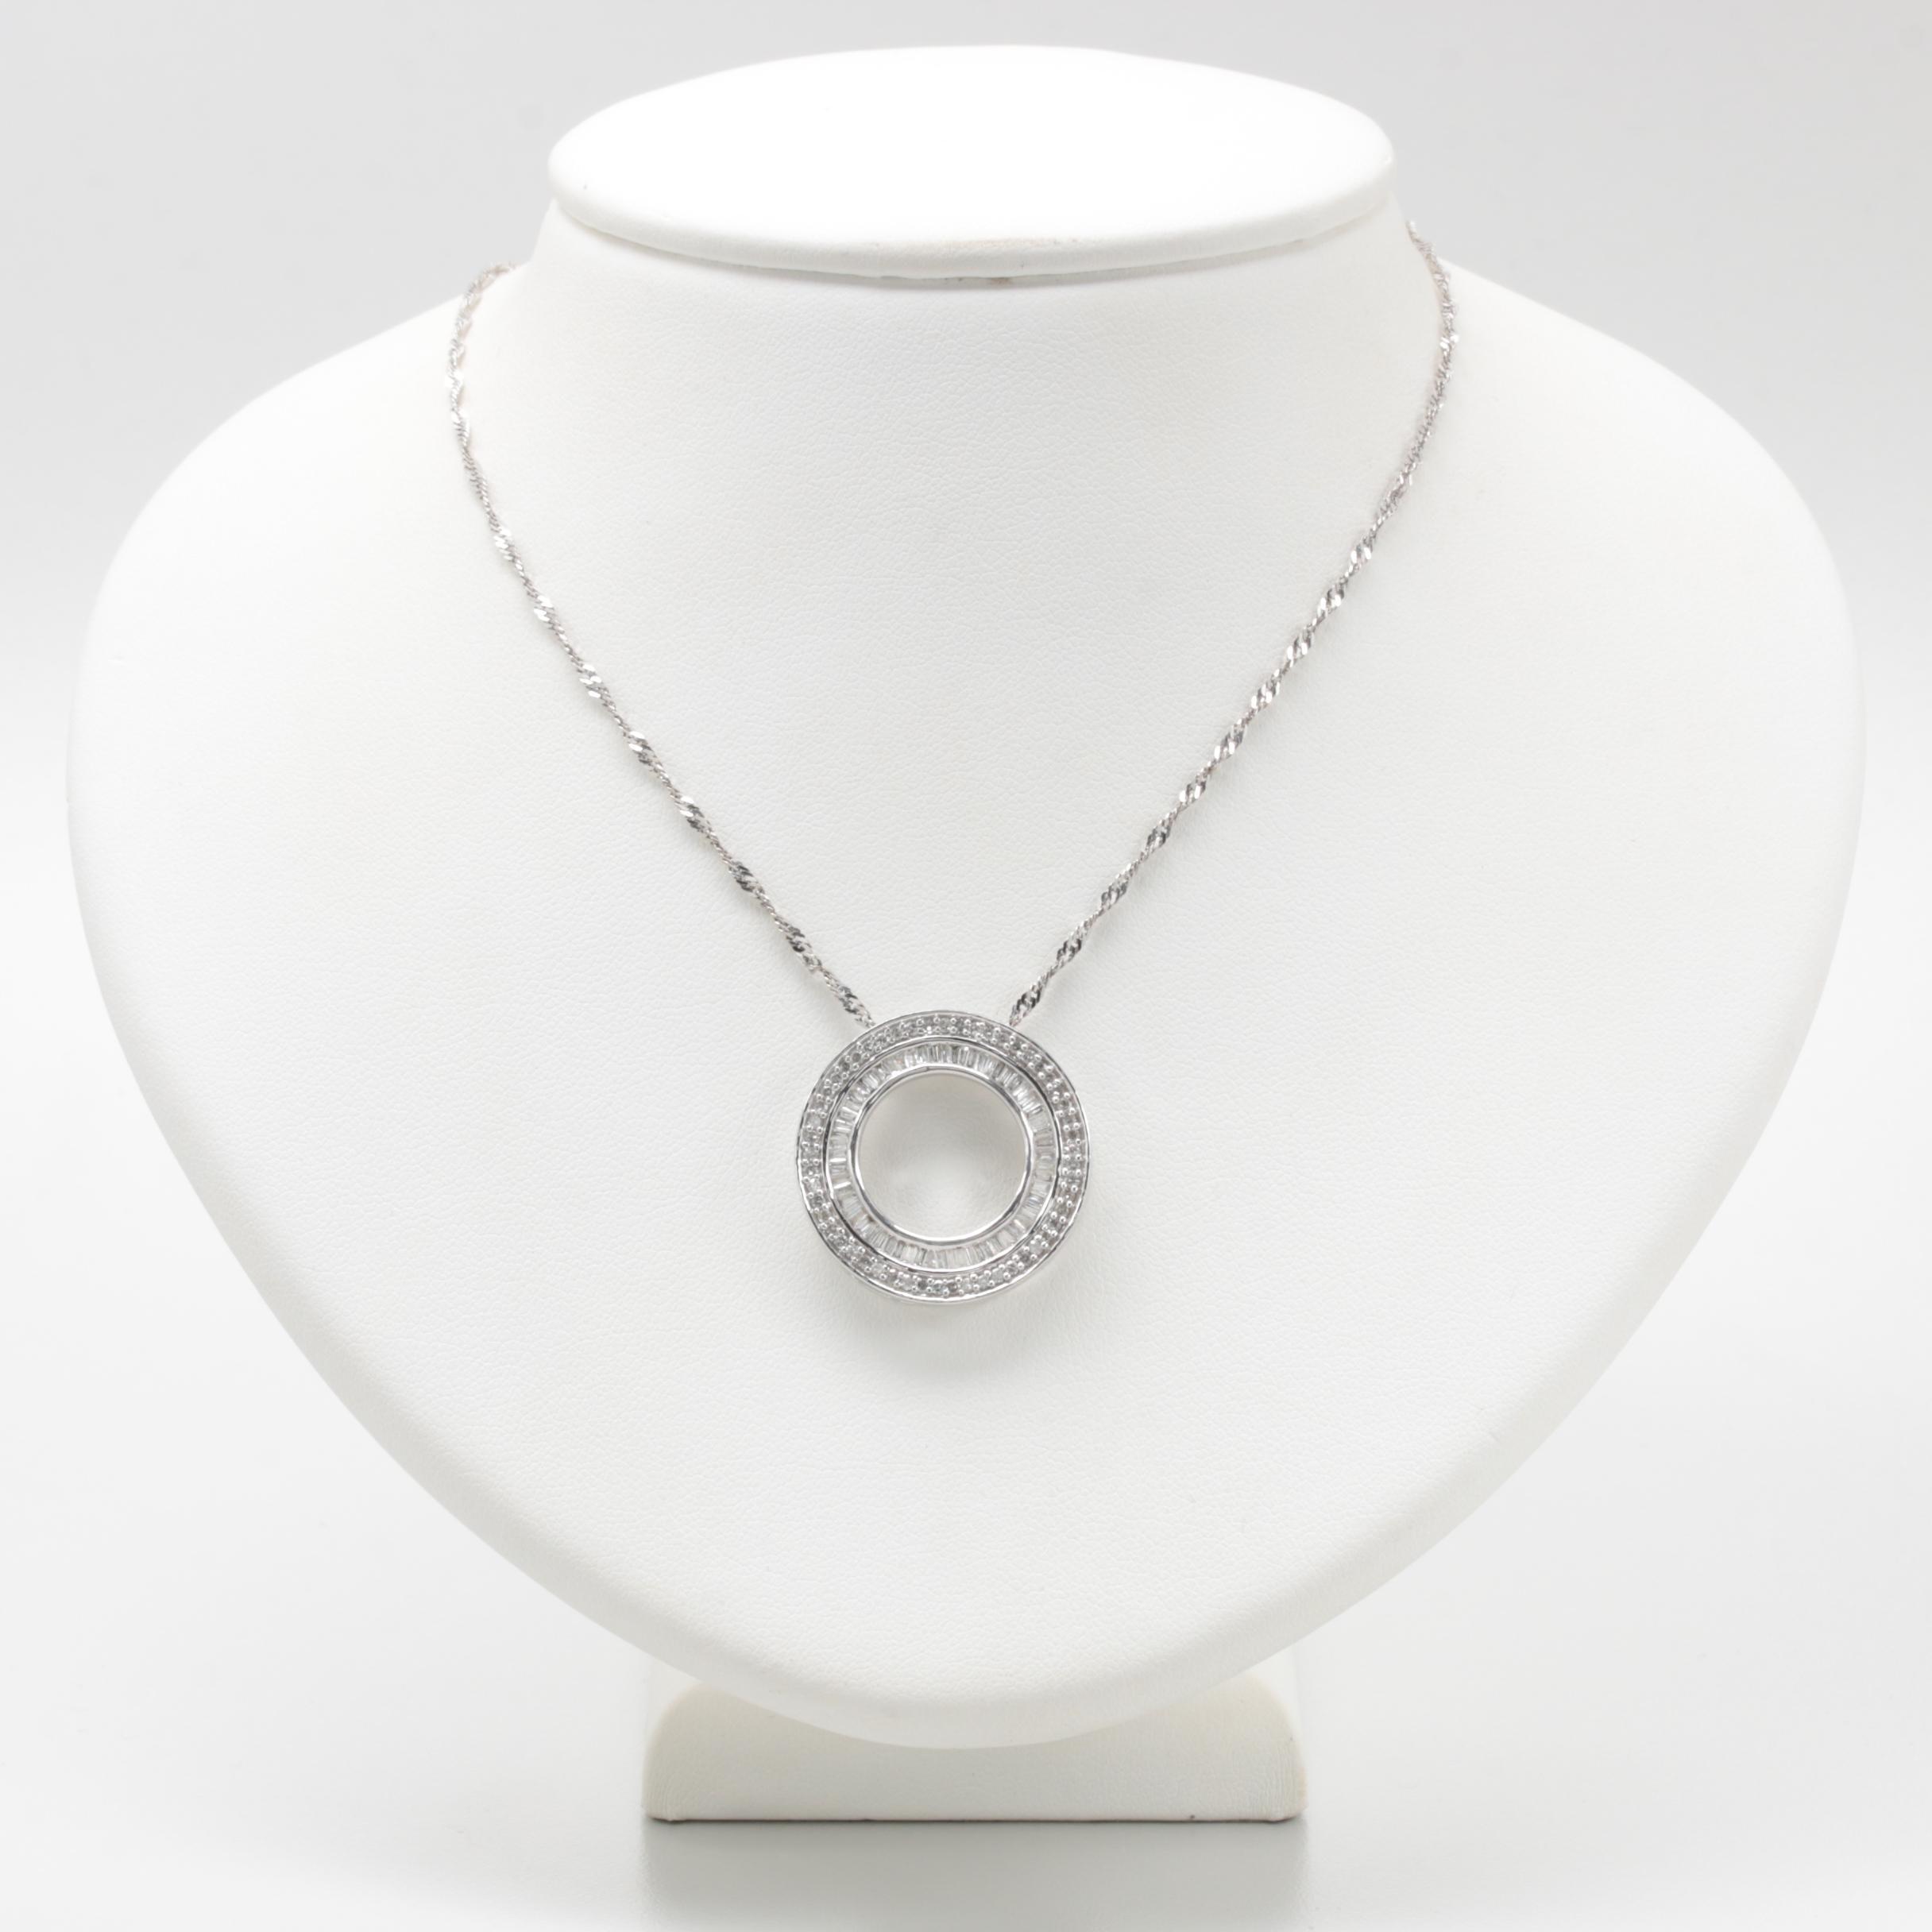 14K White Gold 1.33 CTW Diamond Pendant Necklace